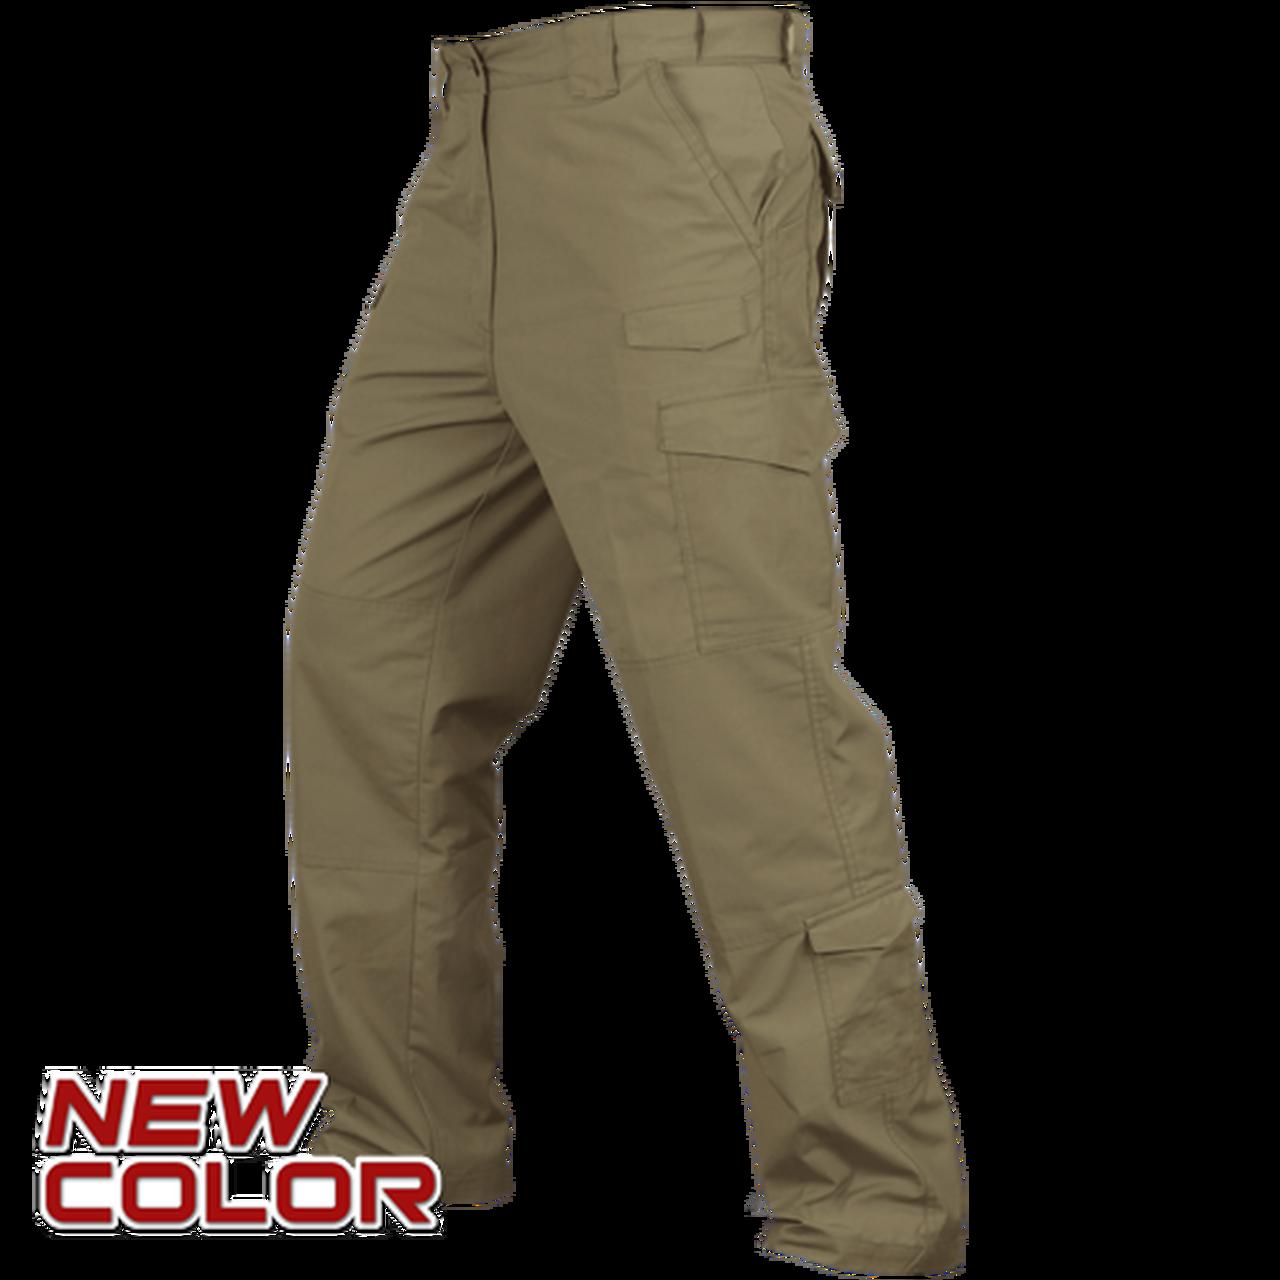 Condor Sentinel Tactical Pants - Lightweight Ripstop